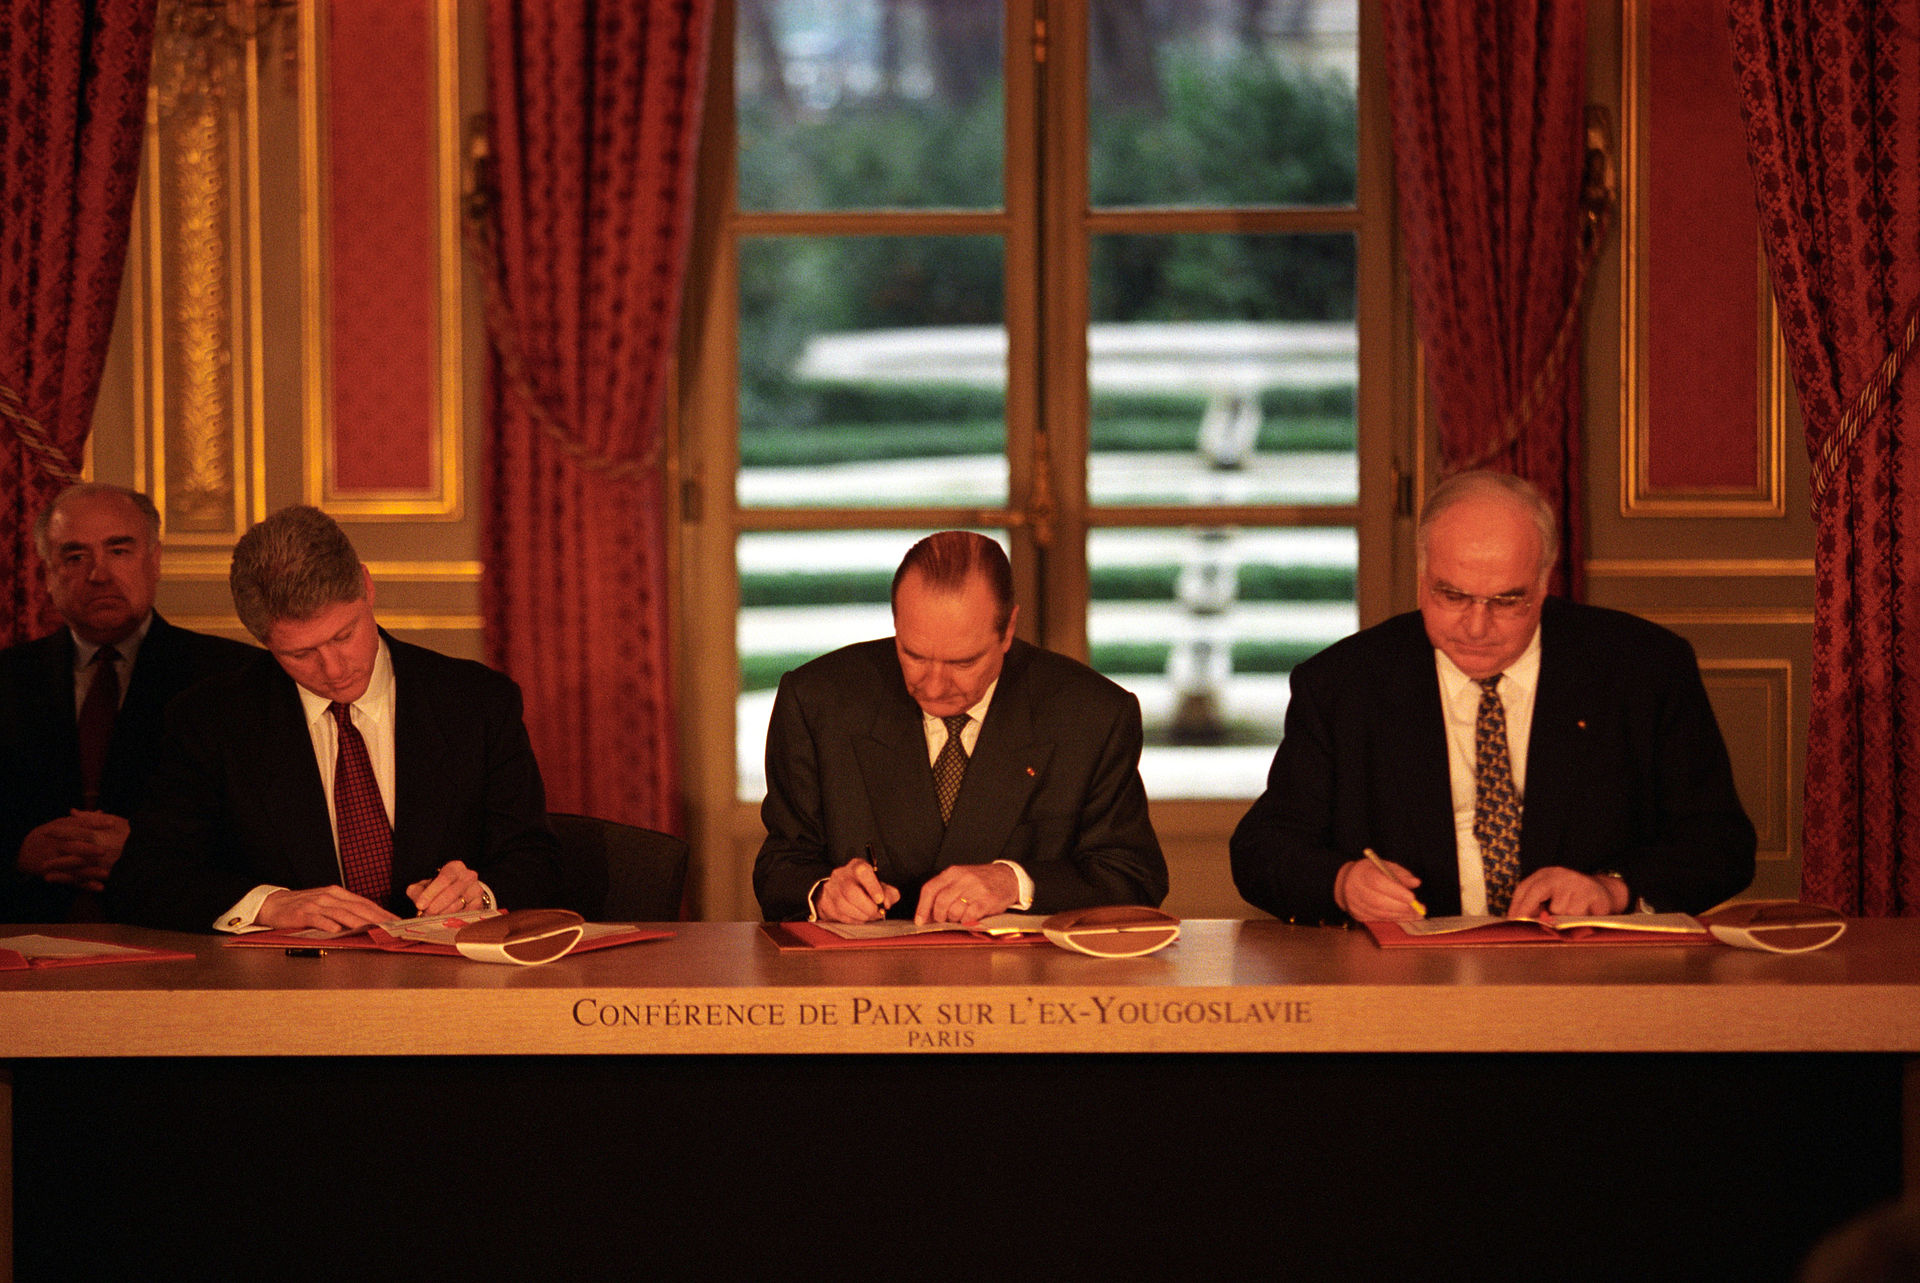 Clinton_Chirac_Kohl_sign_the_Balkan_Peace_Agreement.jpg